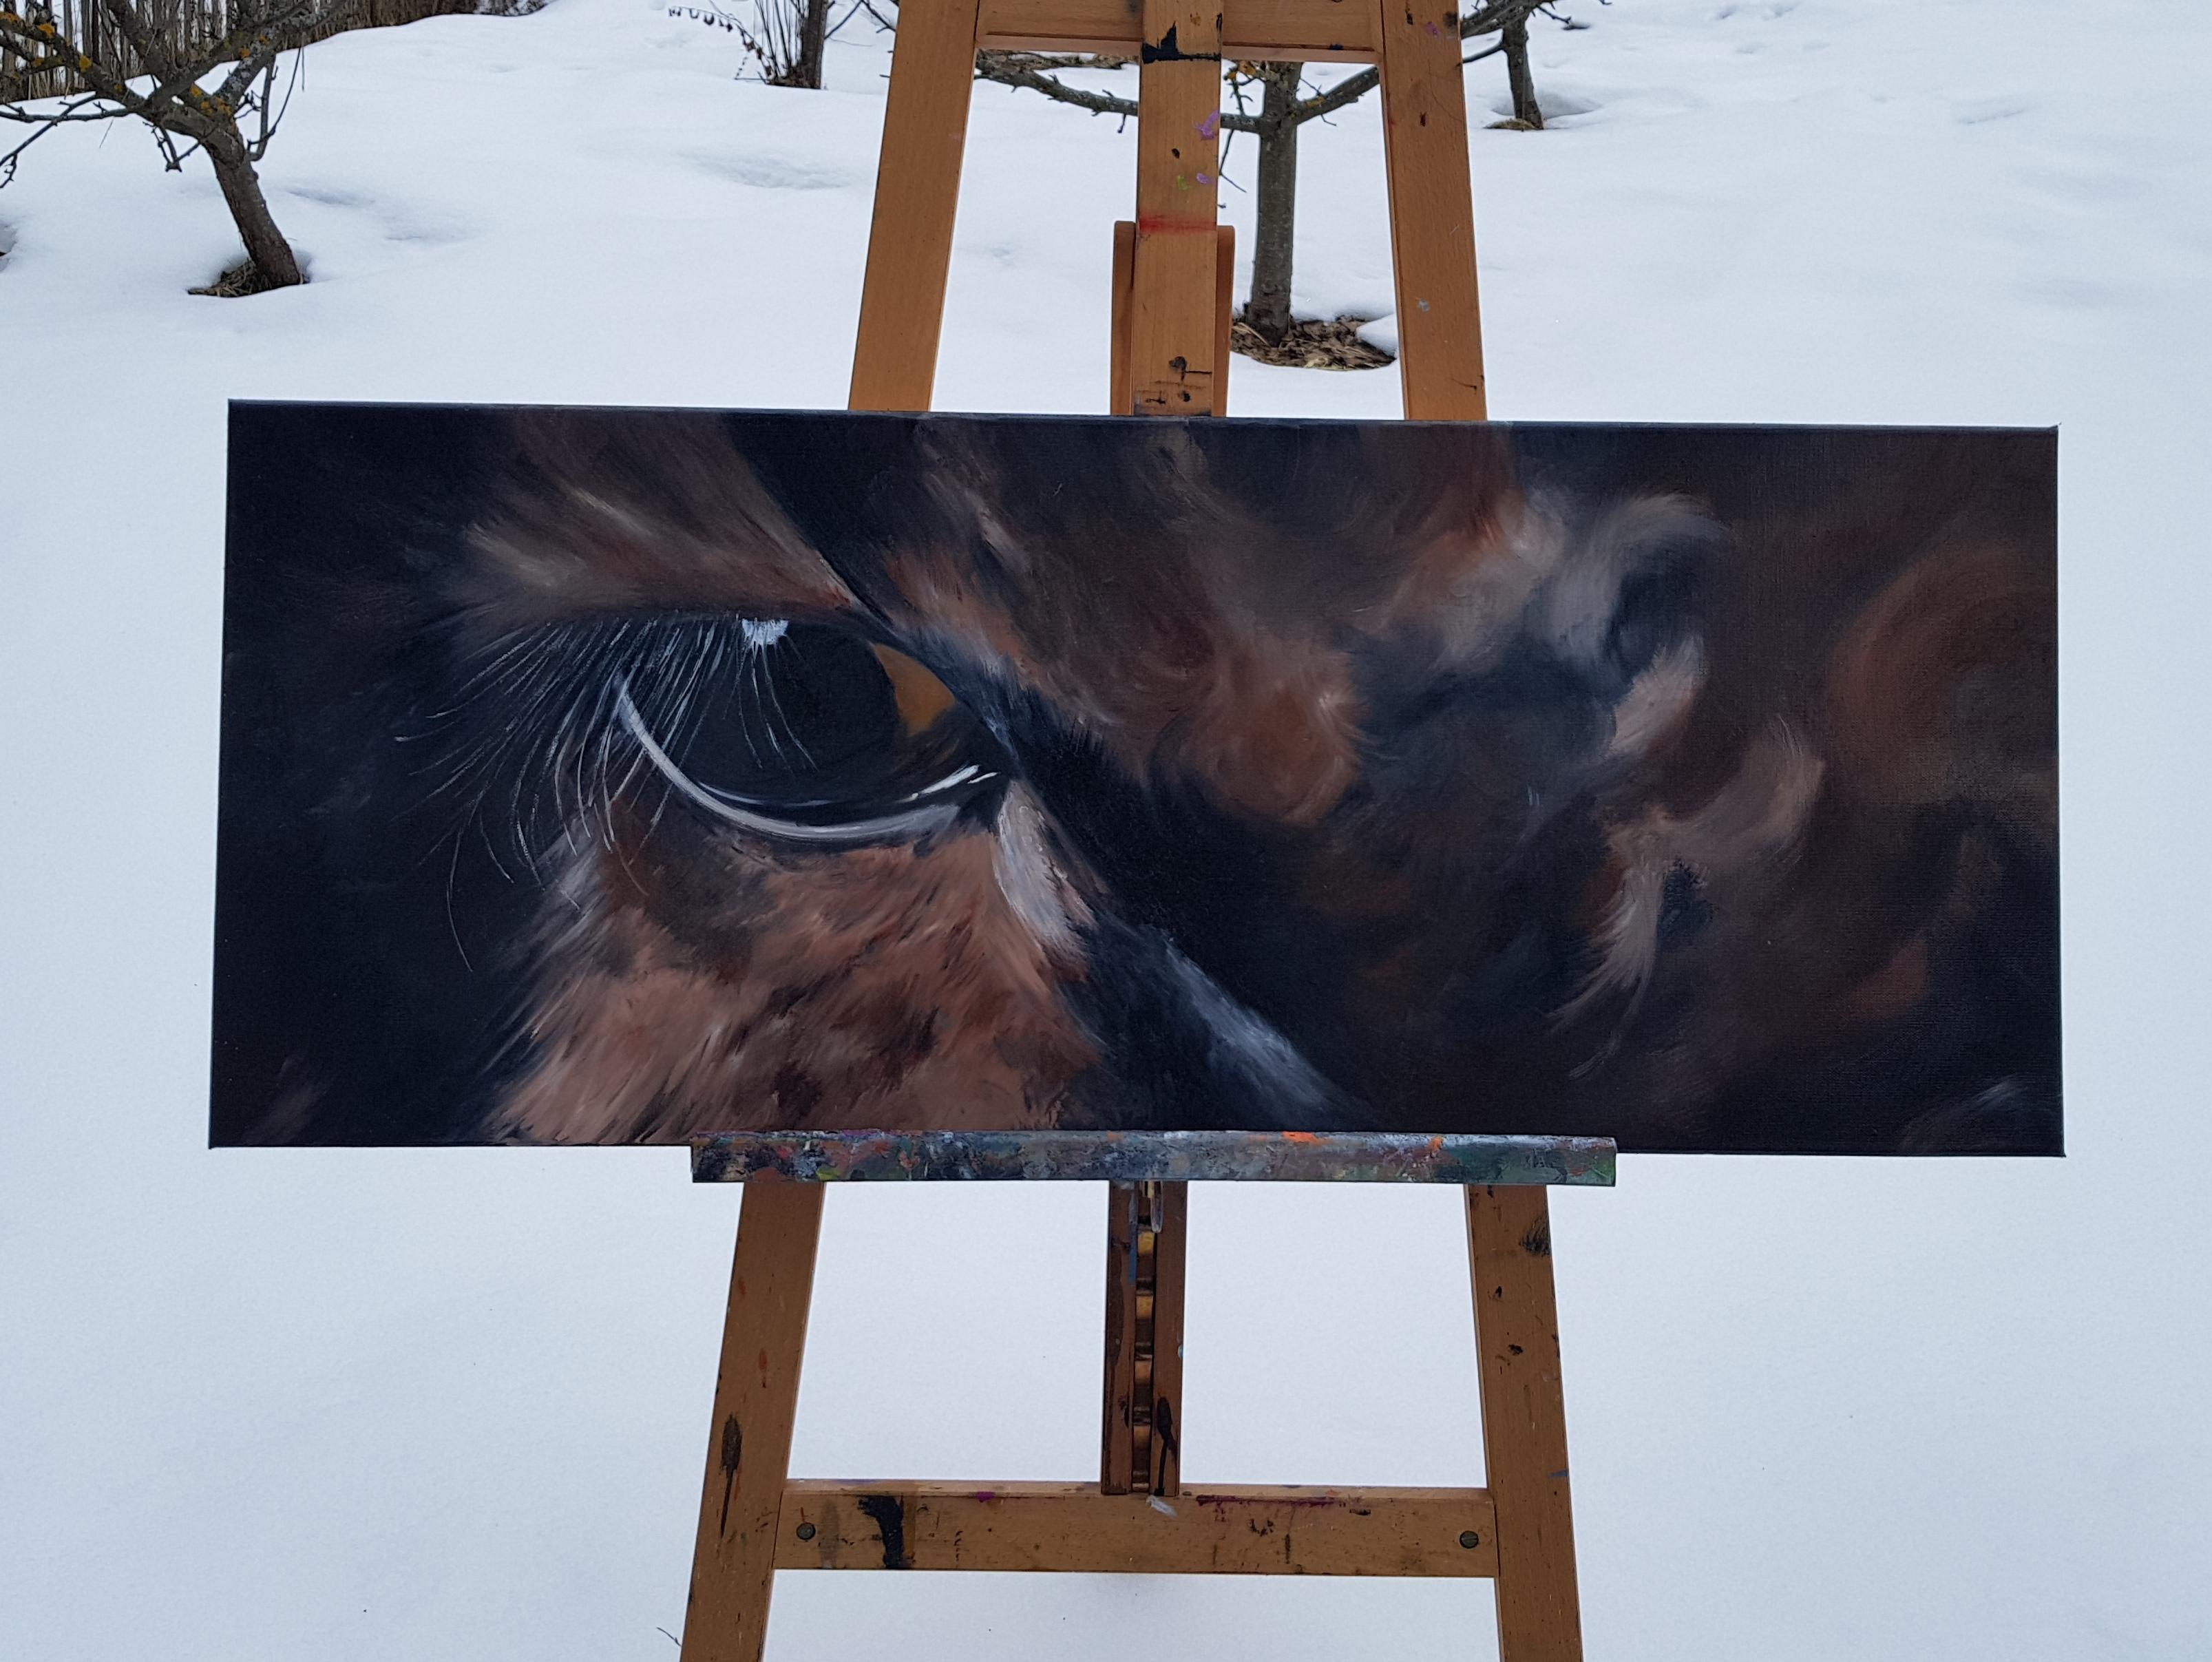 L'oeil vache